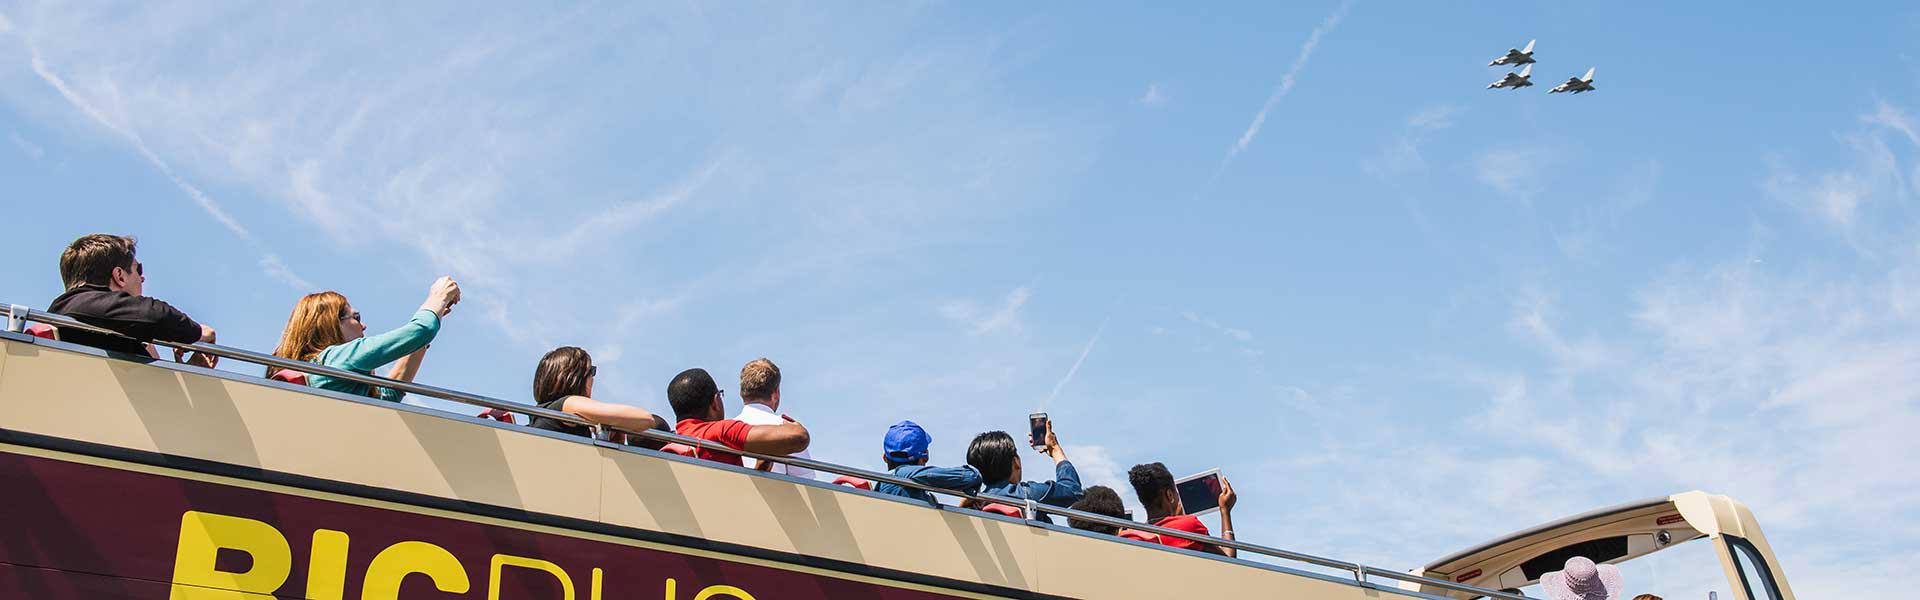 Tourists on Rome Big Bus